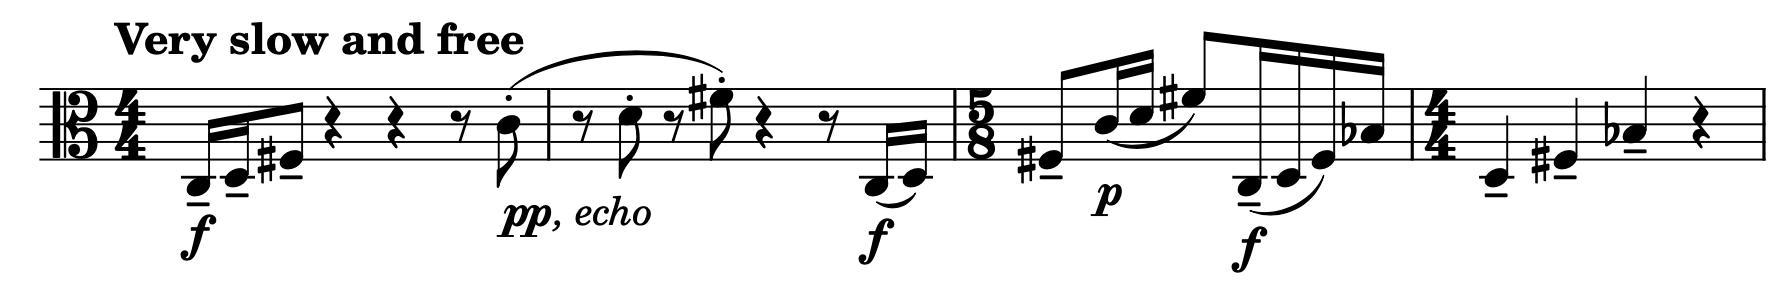 A short viola solo